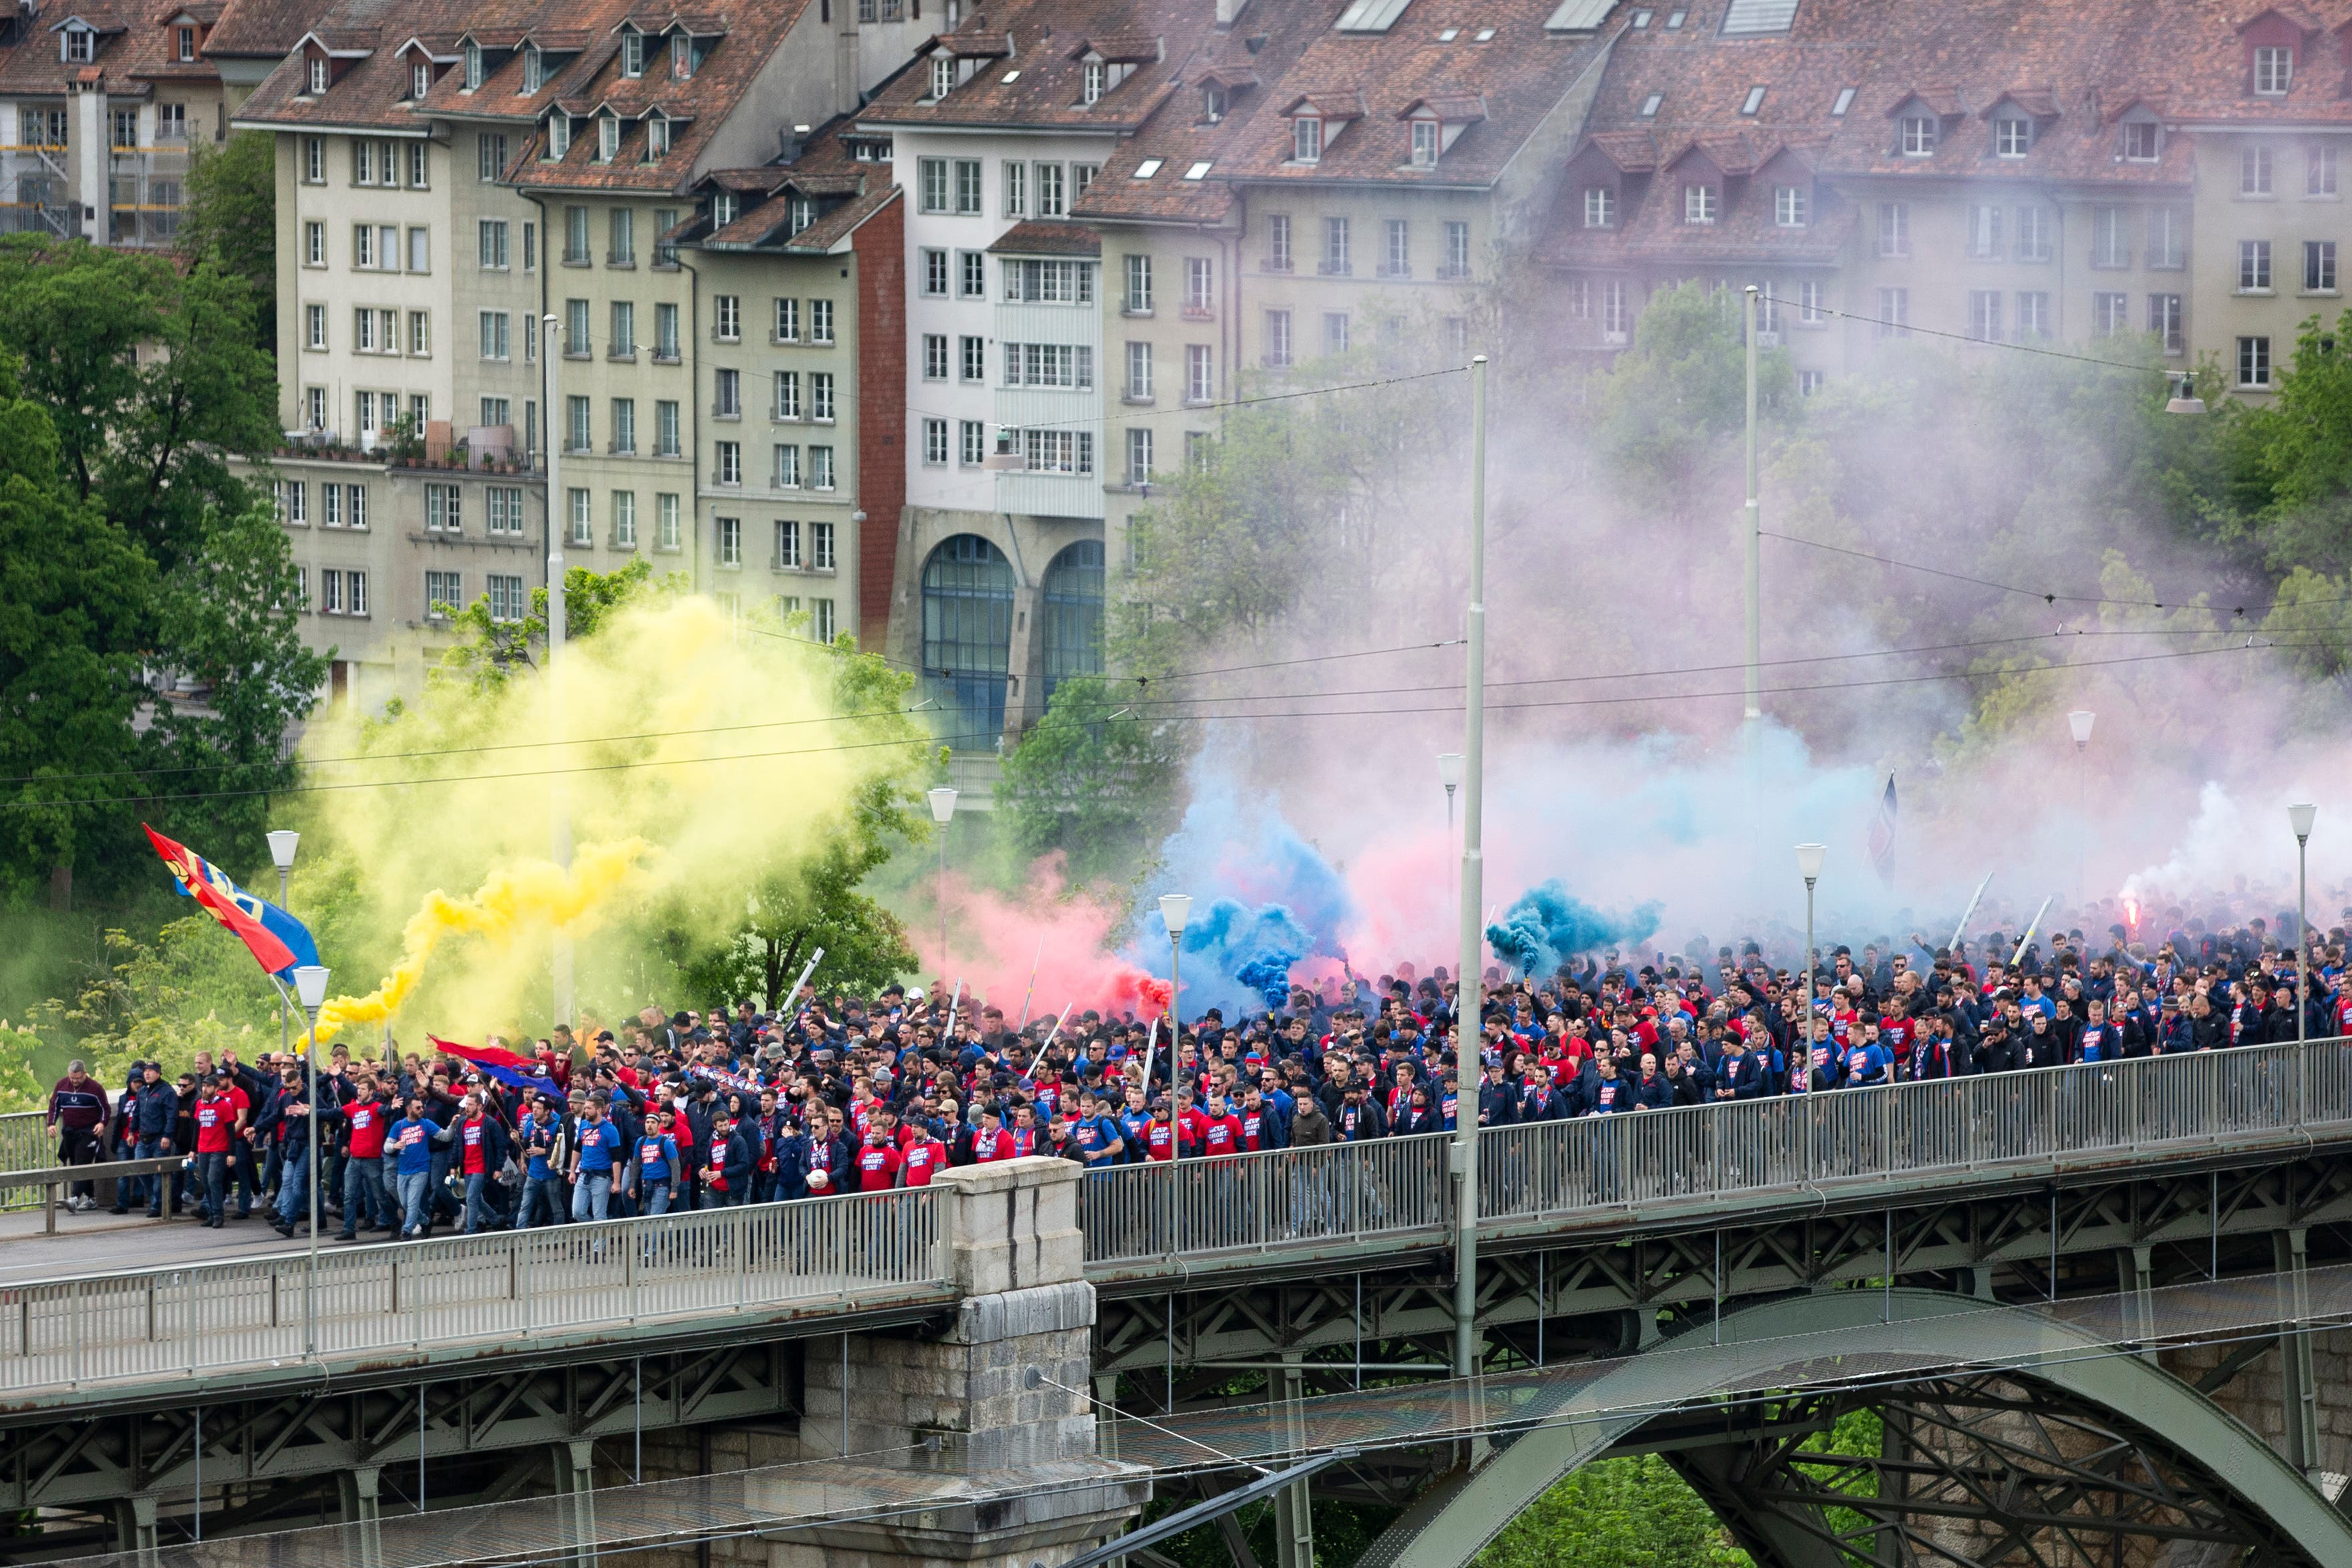 Die Baselfans marschieren zum Anlass des Cupfinalspiels gegen Thun. (Bild: Peter Klaunzer/Keystone)